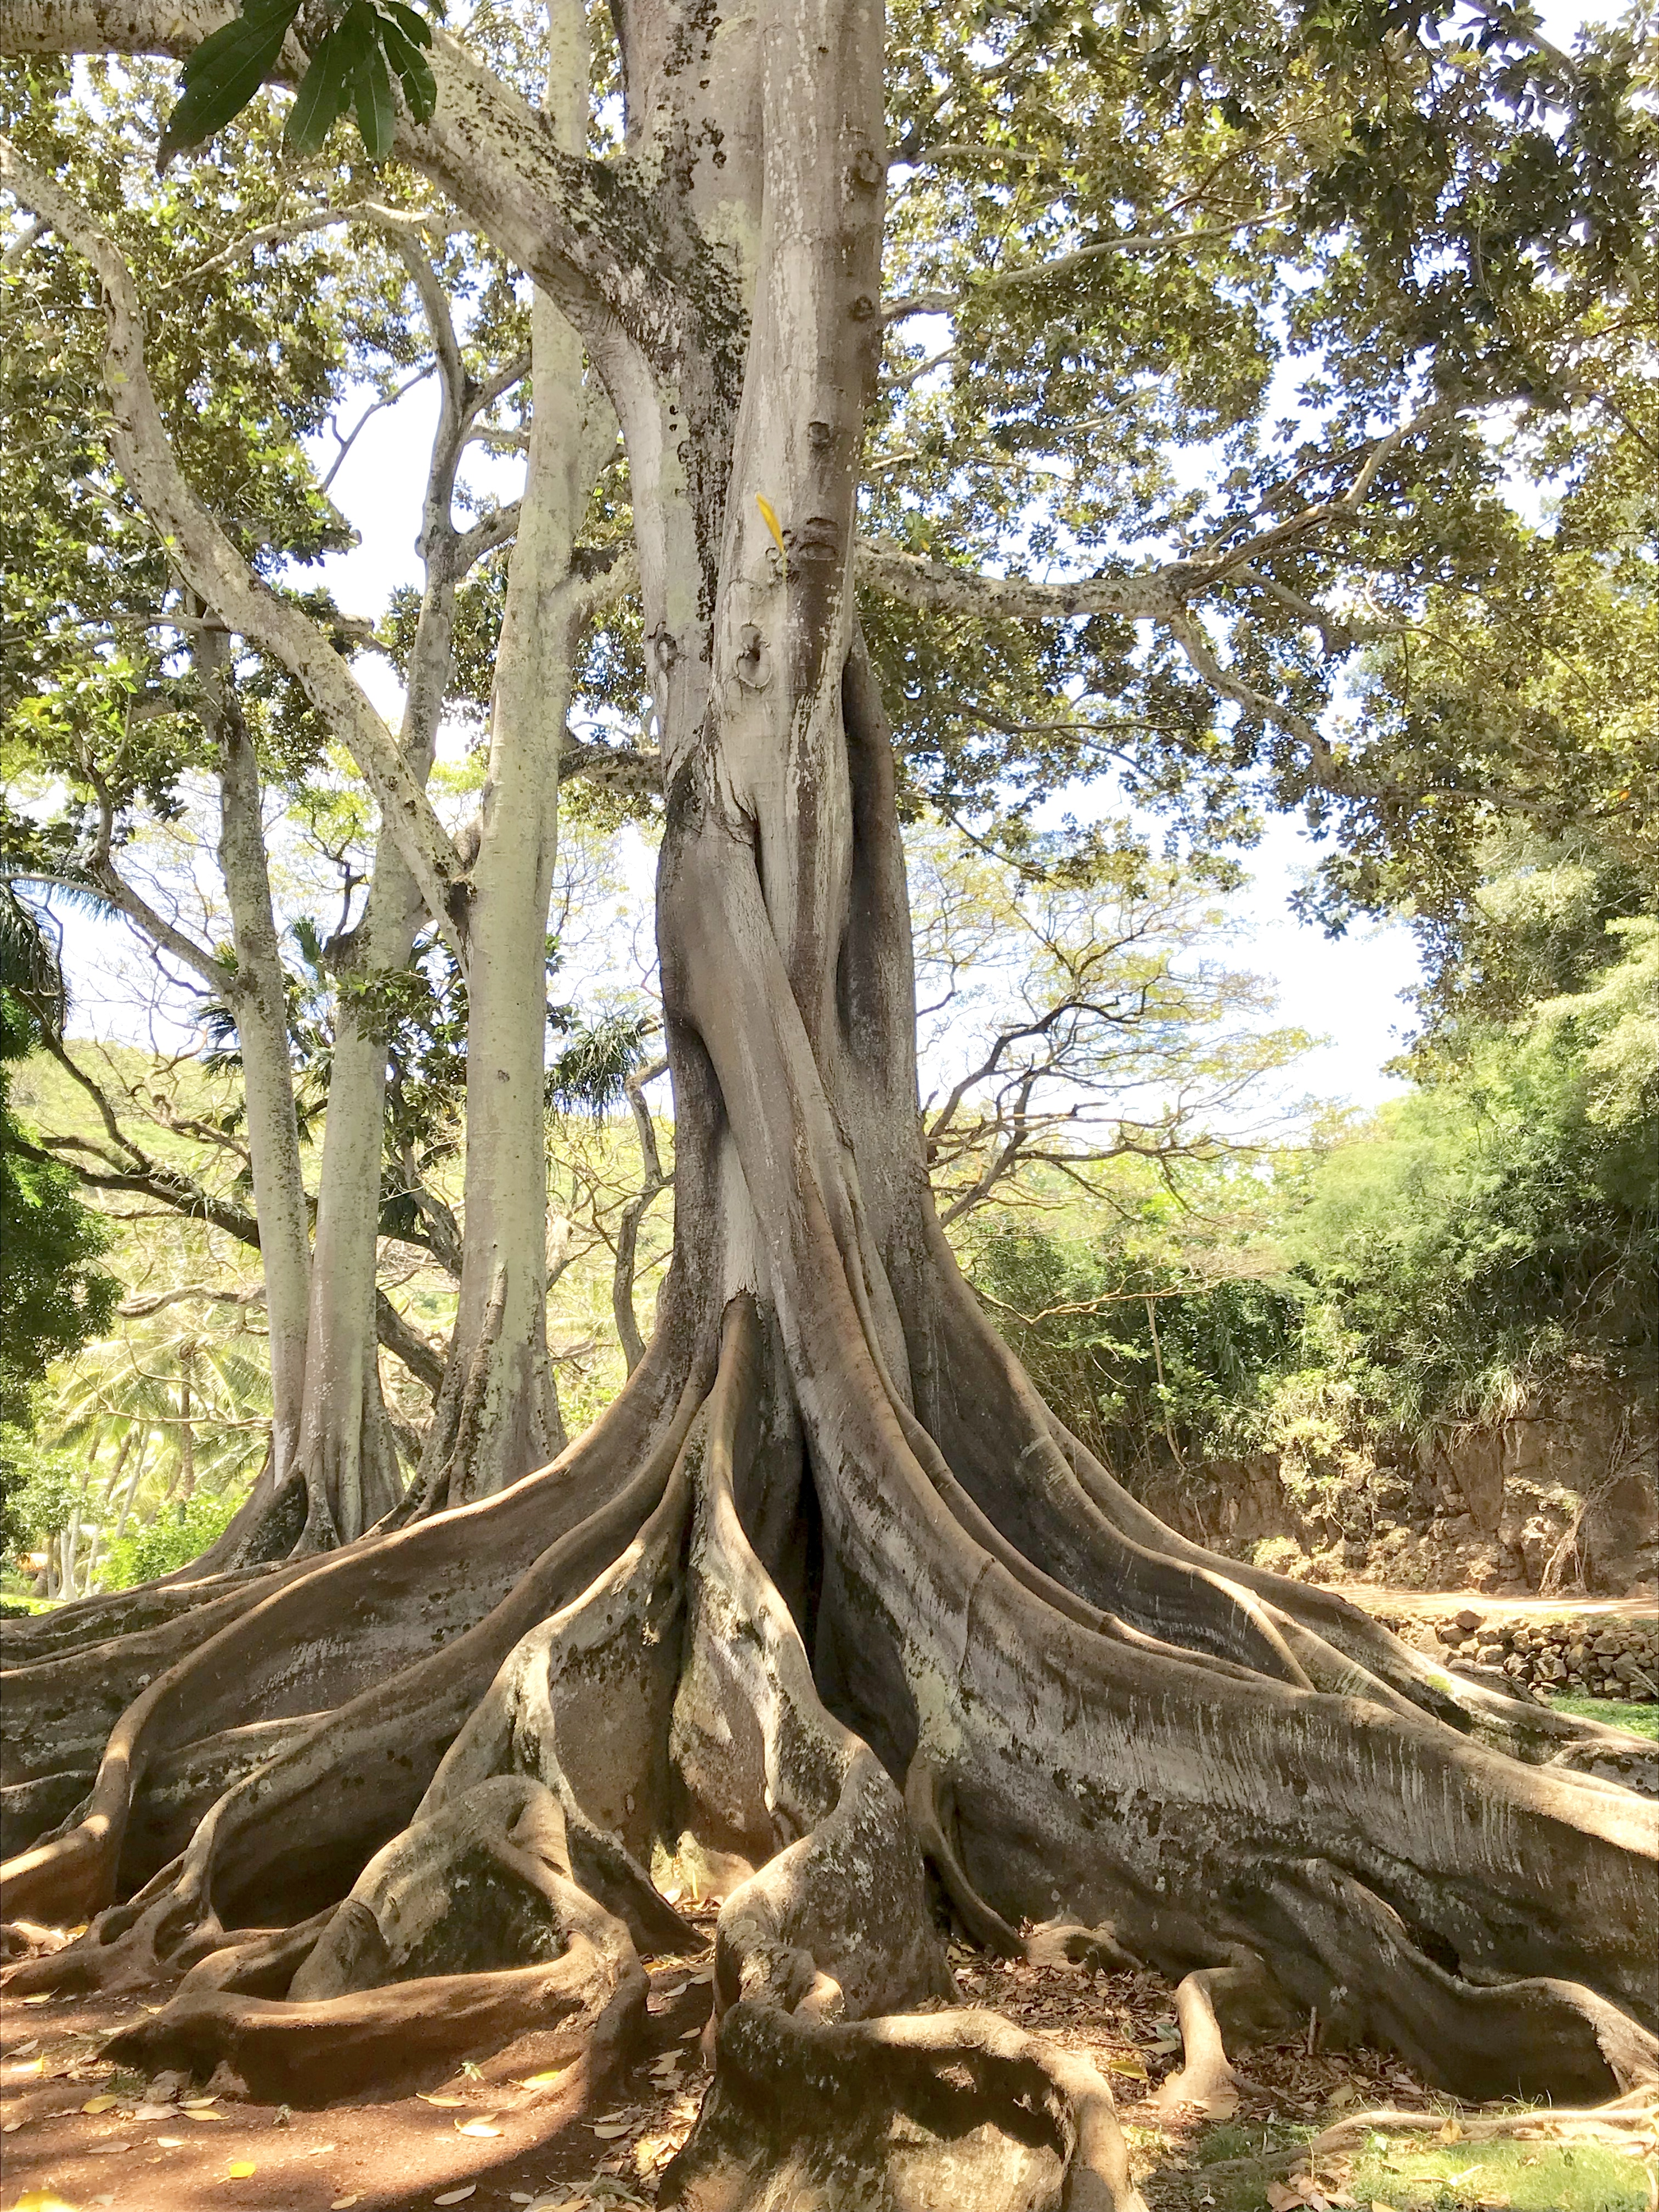 File:Jurassic Park Trees Of Allerton Gardens, National Tropical Botanical  Gardens, Kauai,